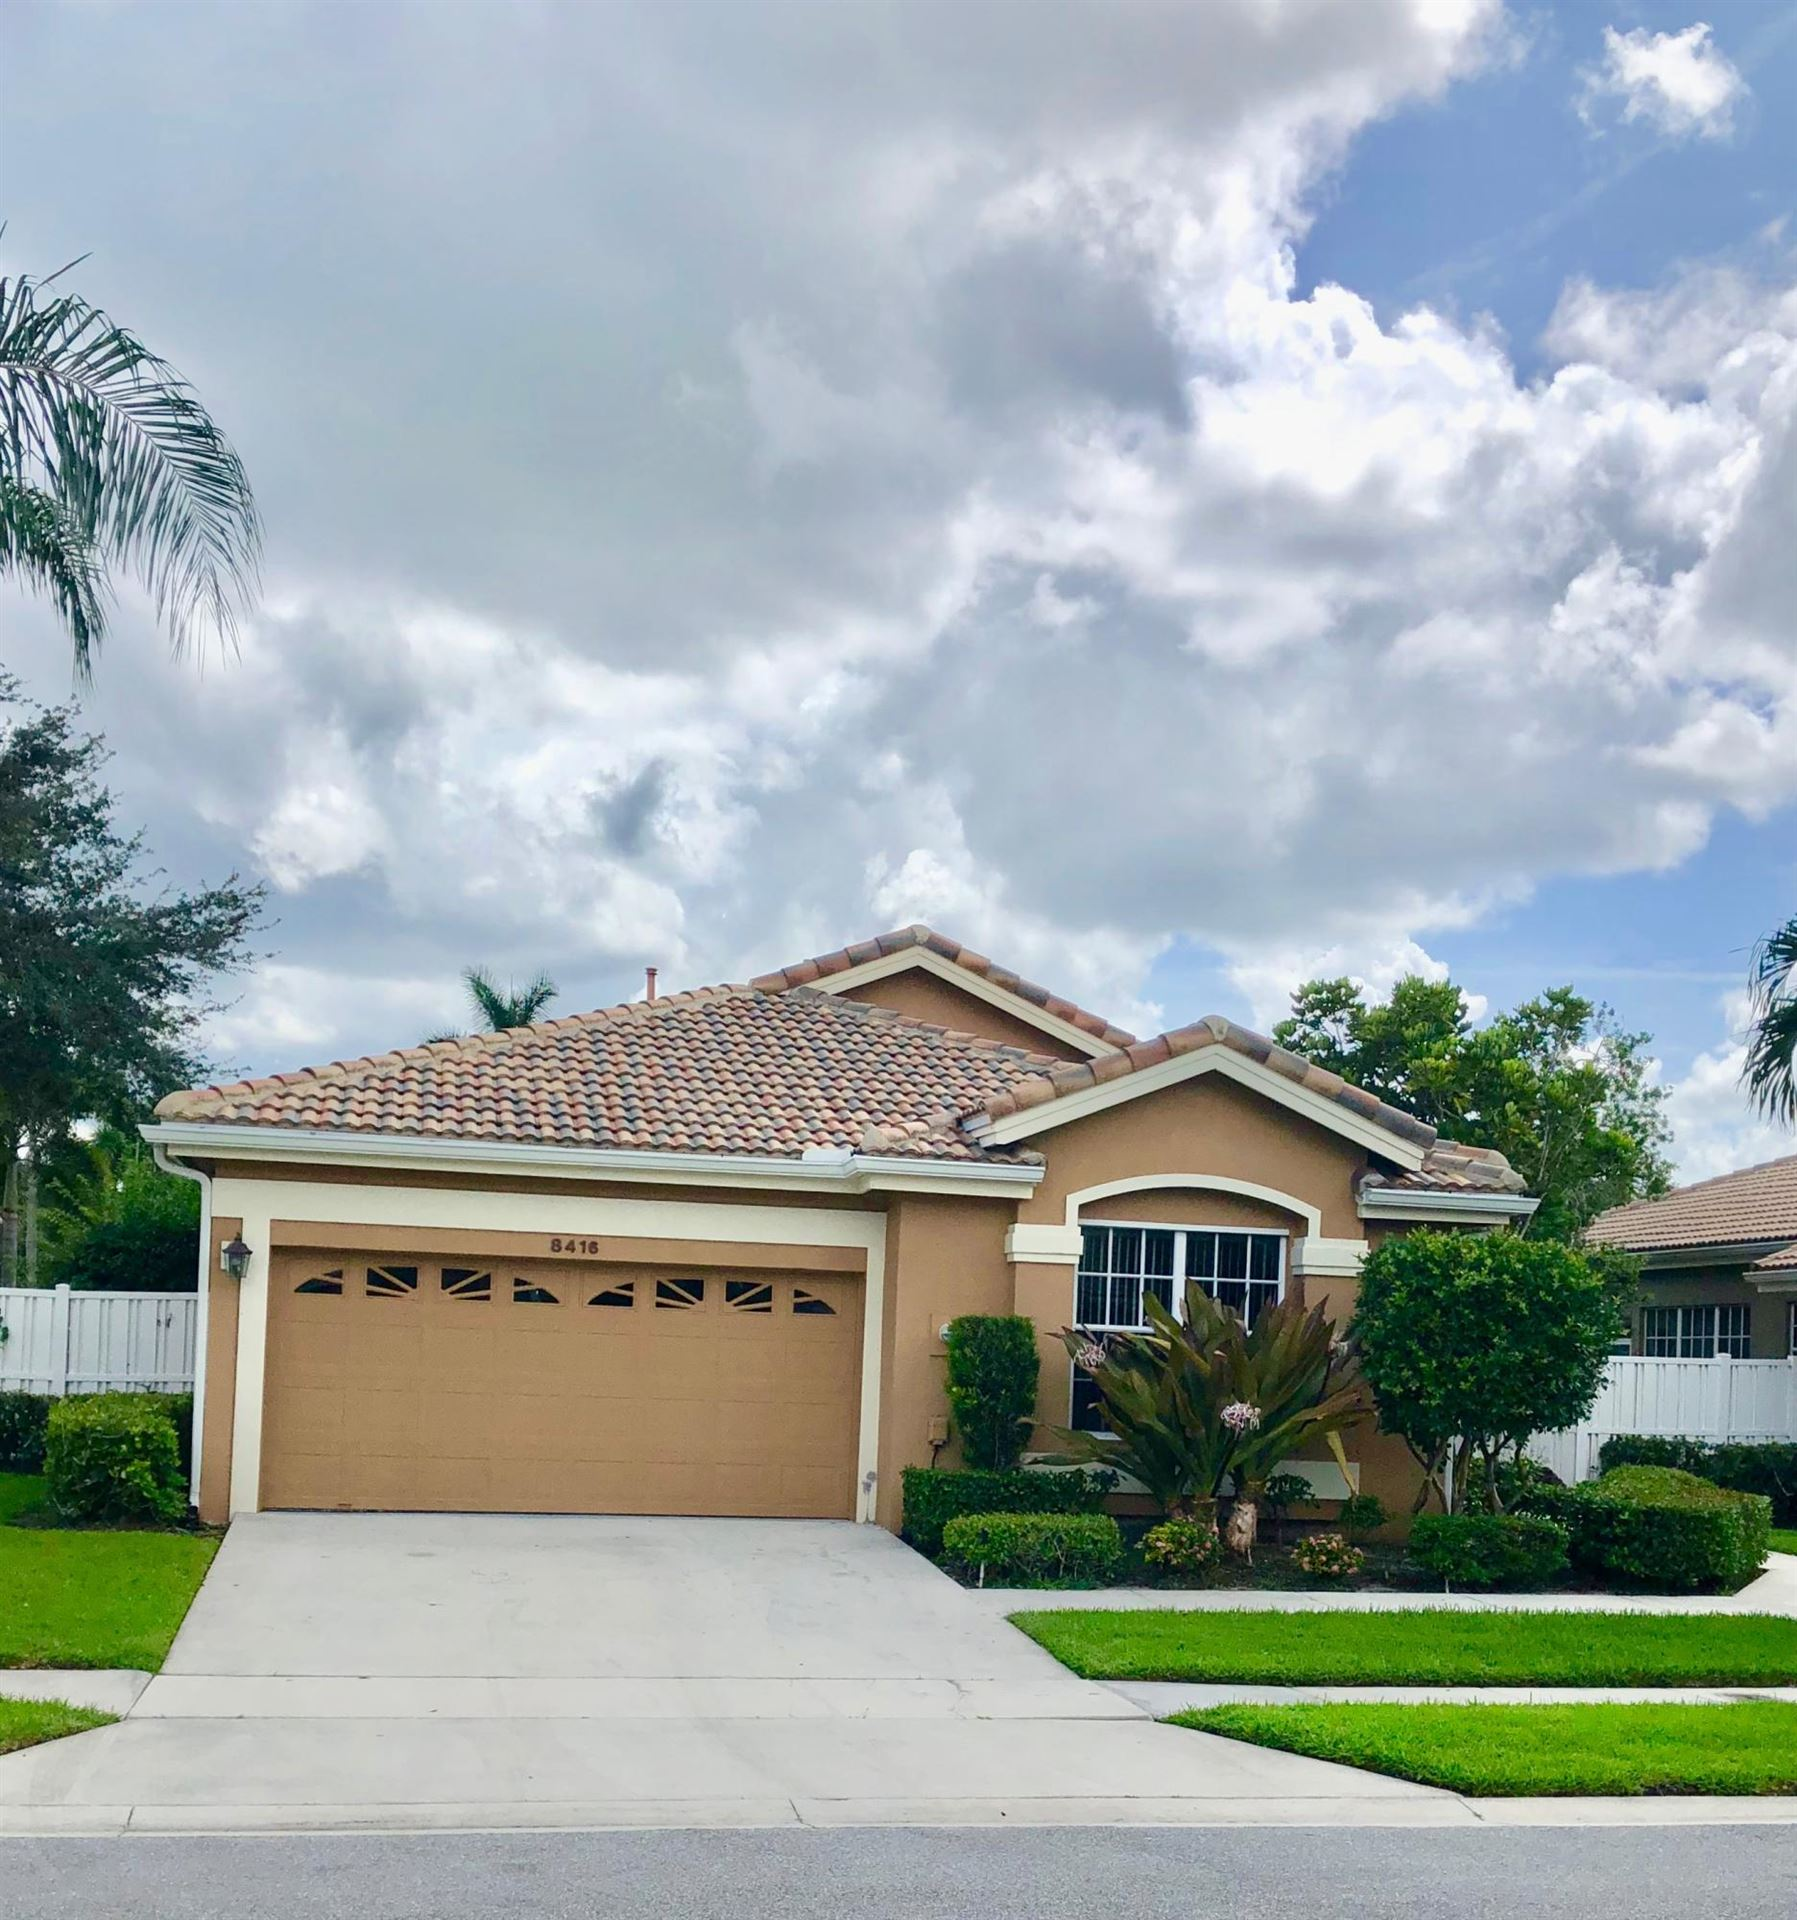 Photo of 8416 Quail Meadow Way, West Palm Beach, FL 33412 (MLS # RX-10735837)